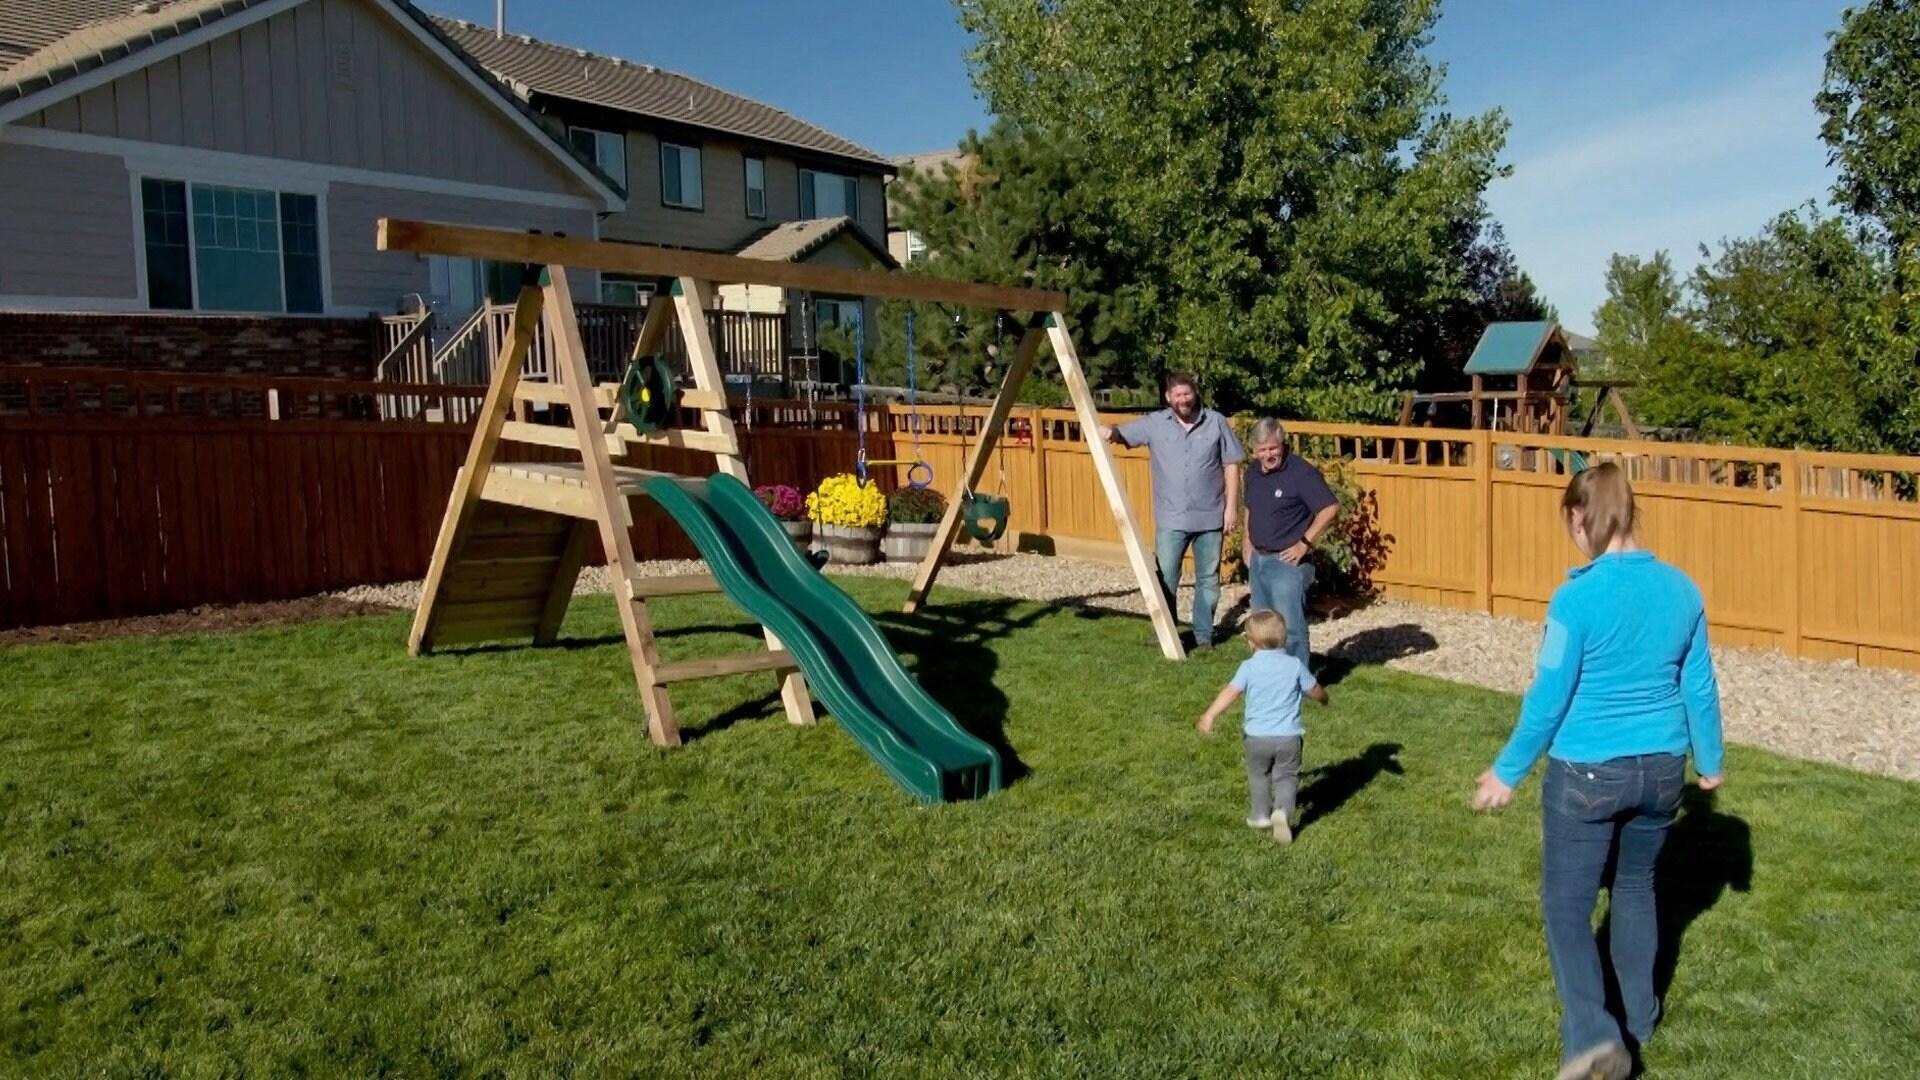 Swing Set; Robotic Construction